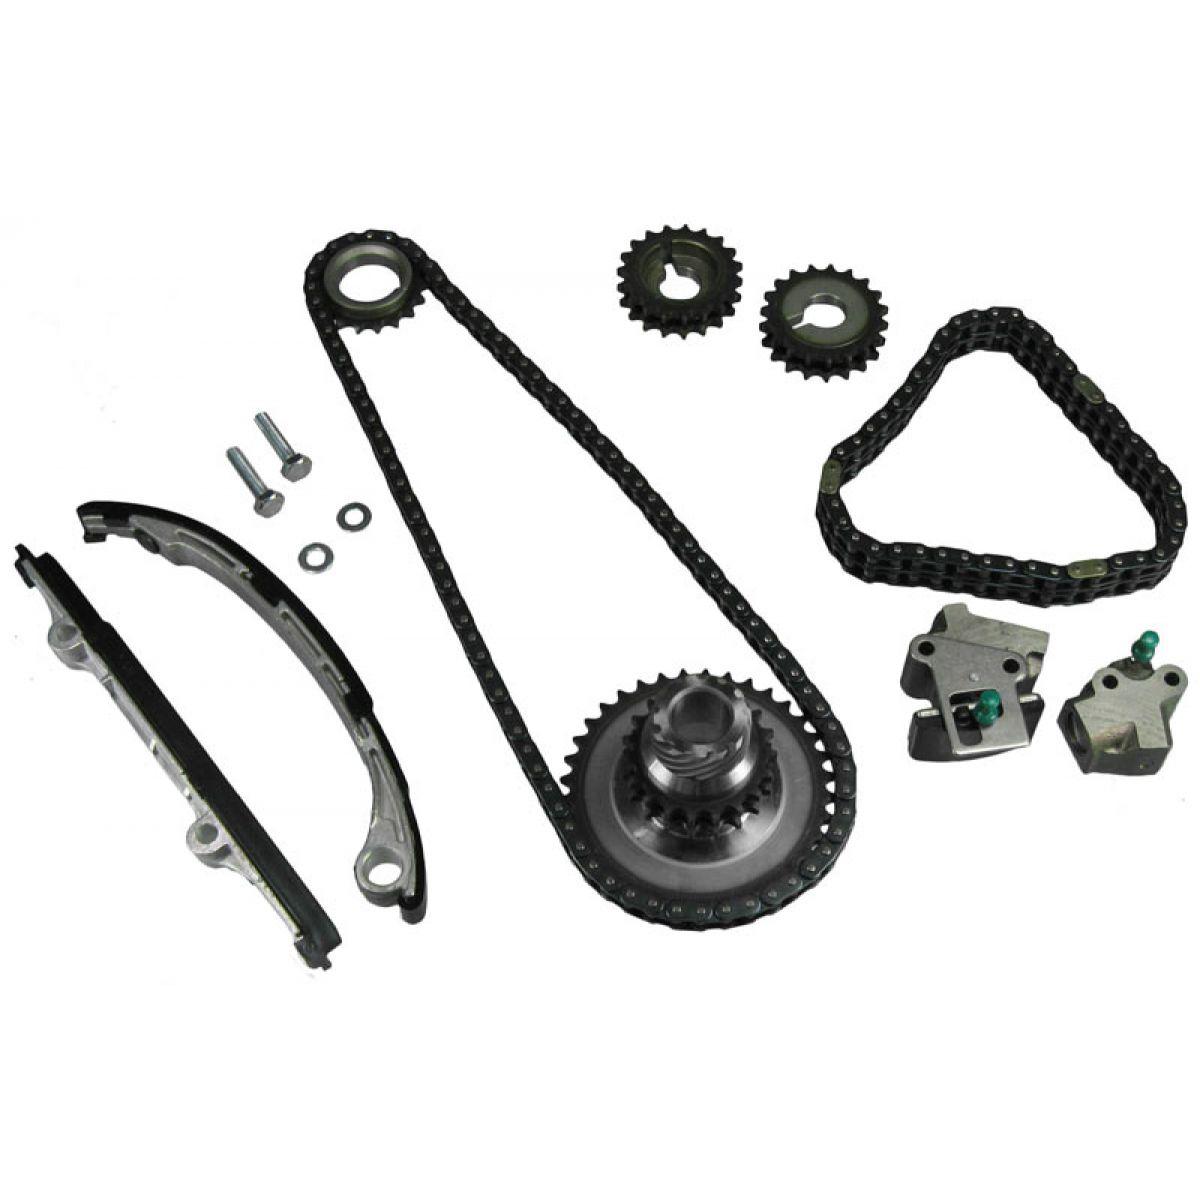 KA24DE 2.4L Complete Timing Chain Kit Set For 91-98 Nissan